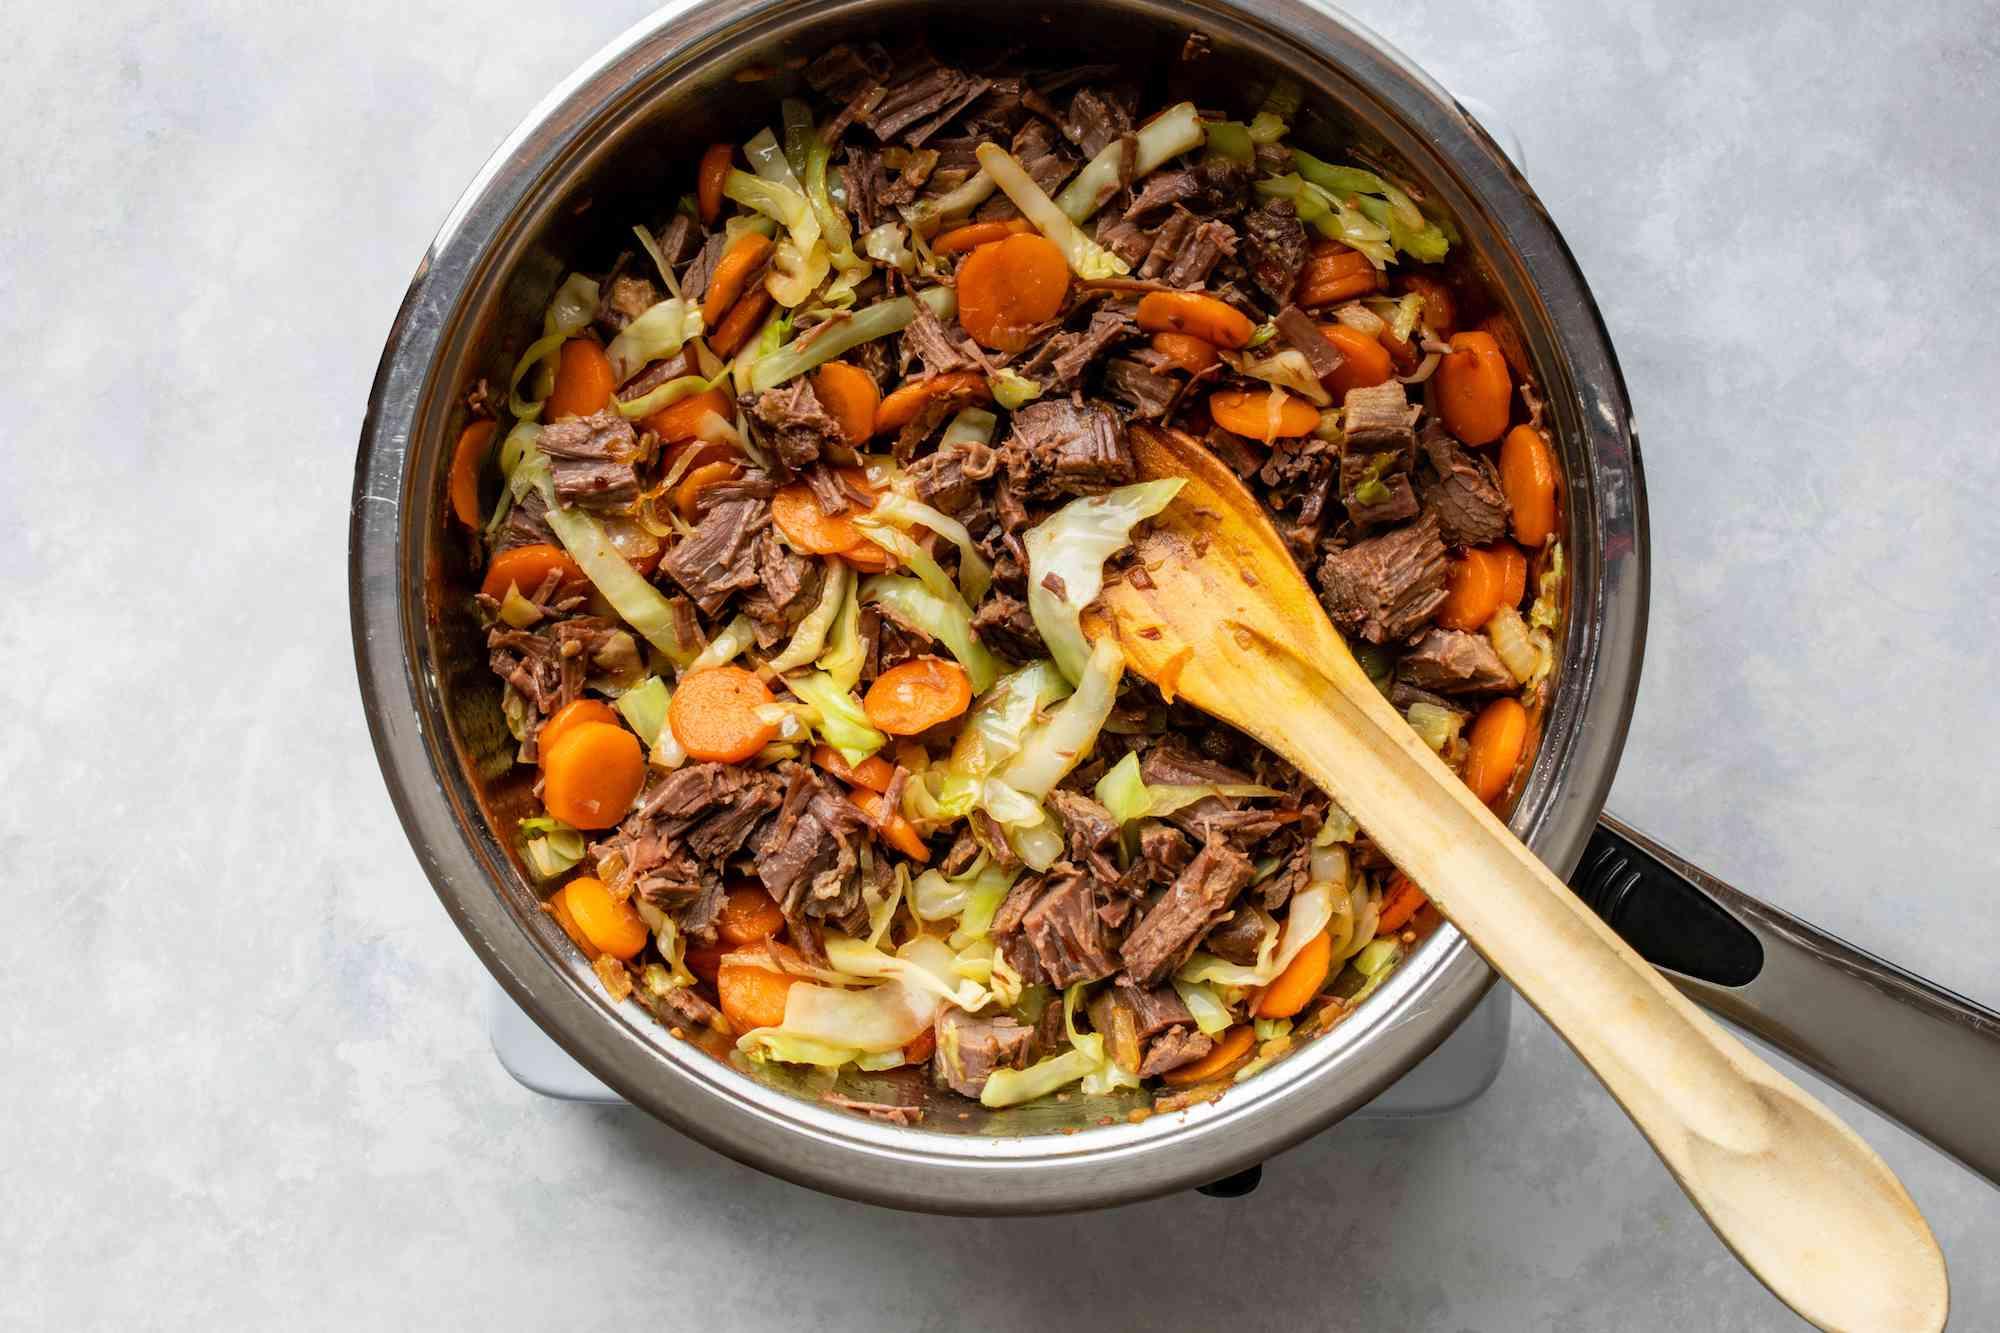 Add corned beef